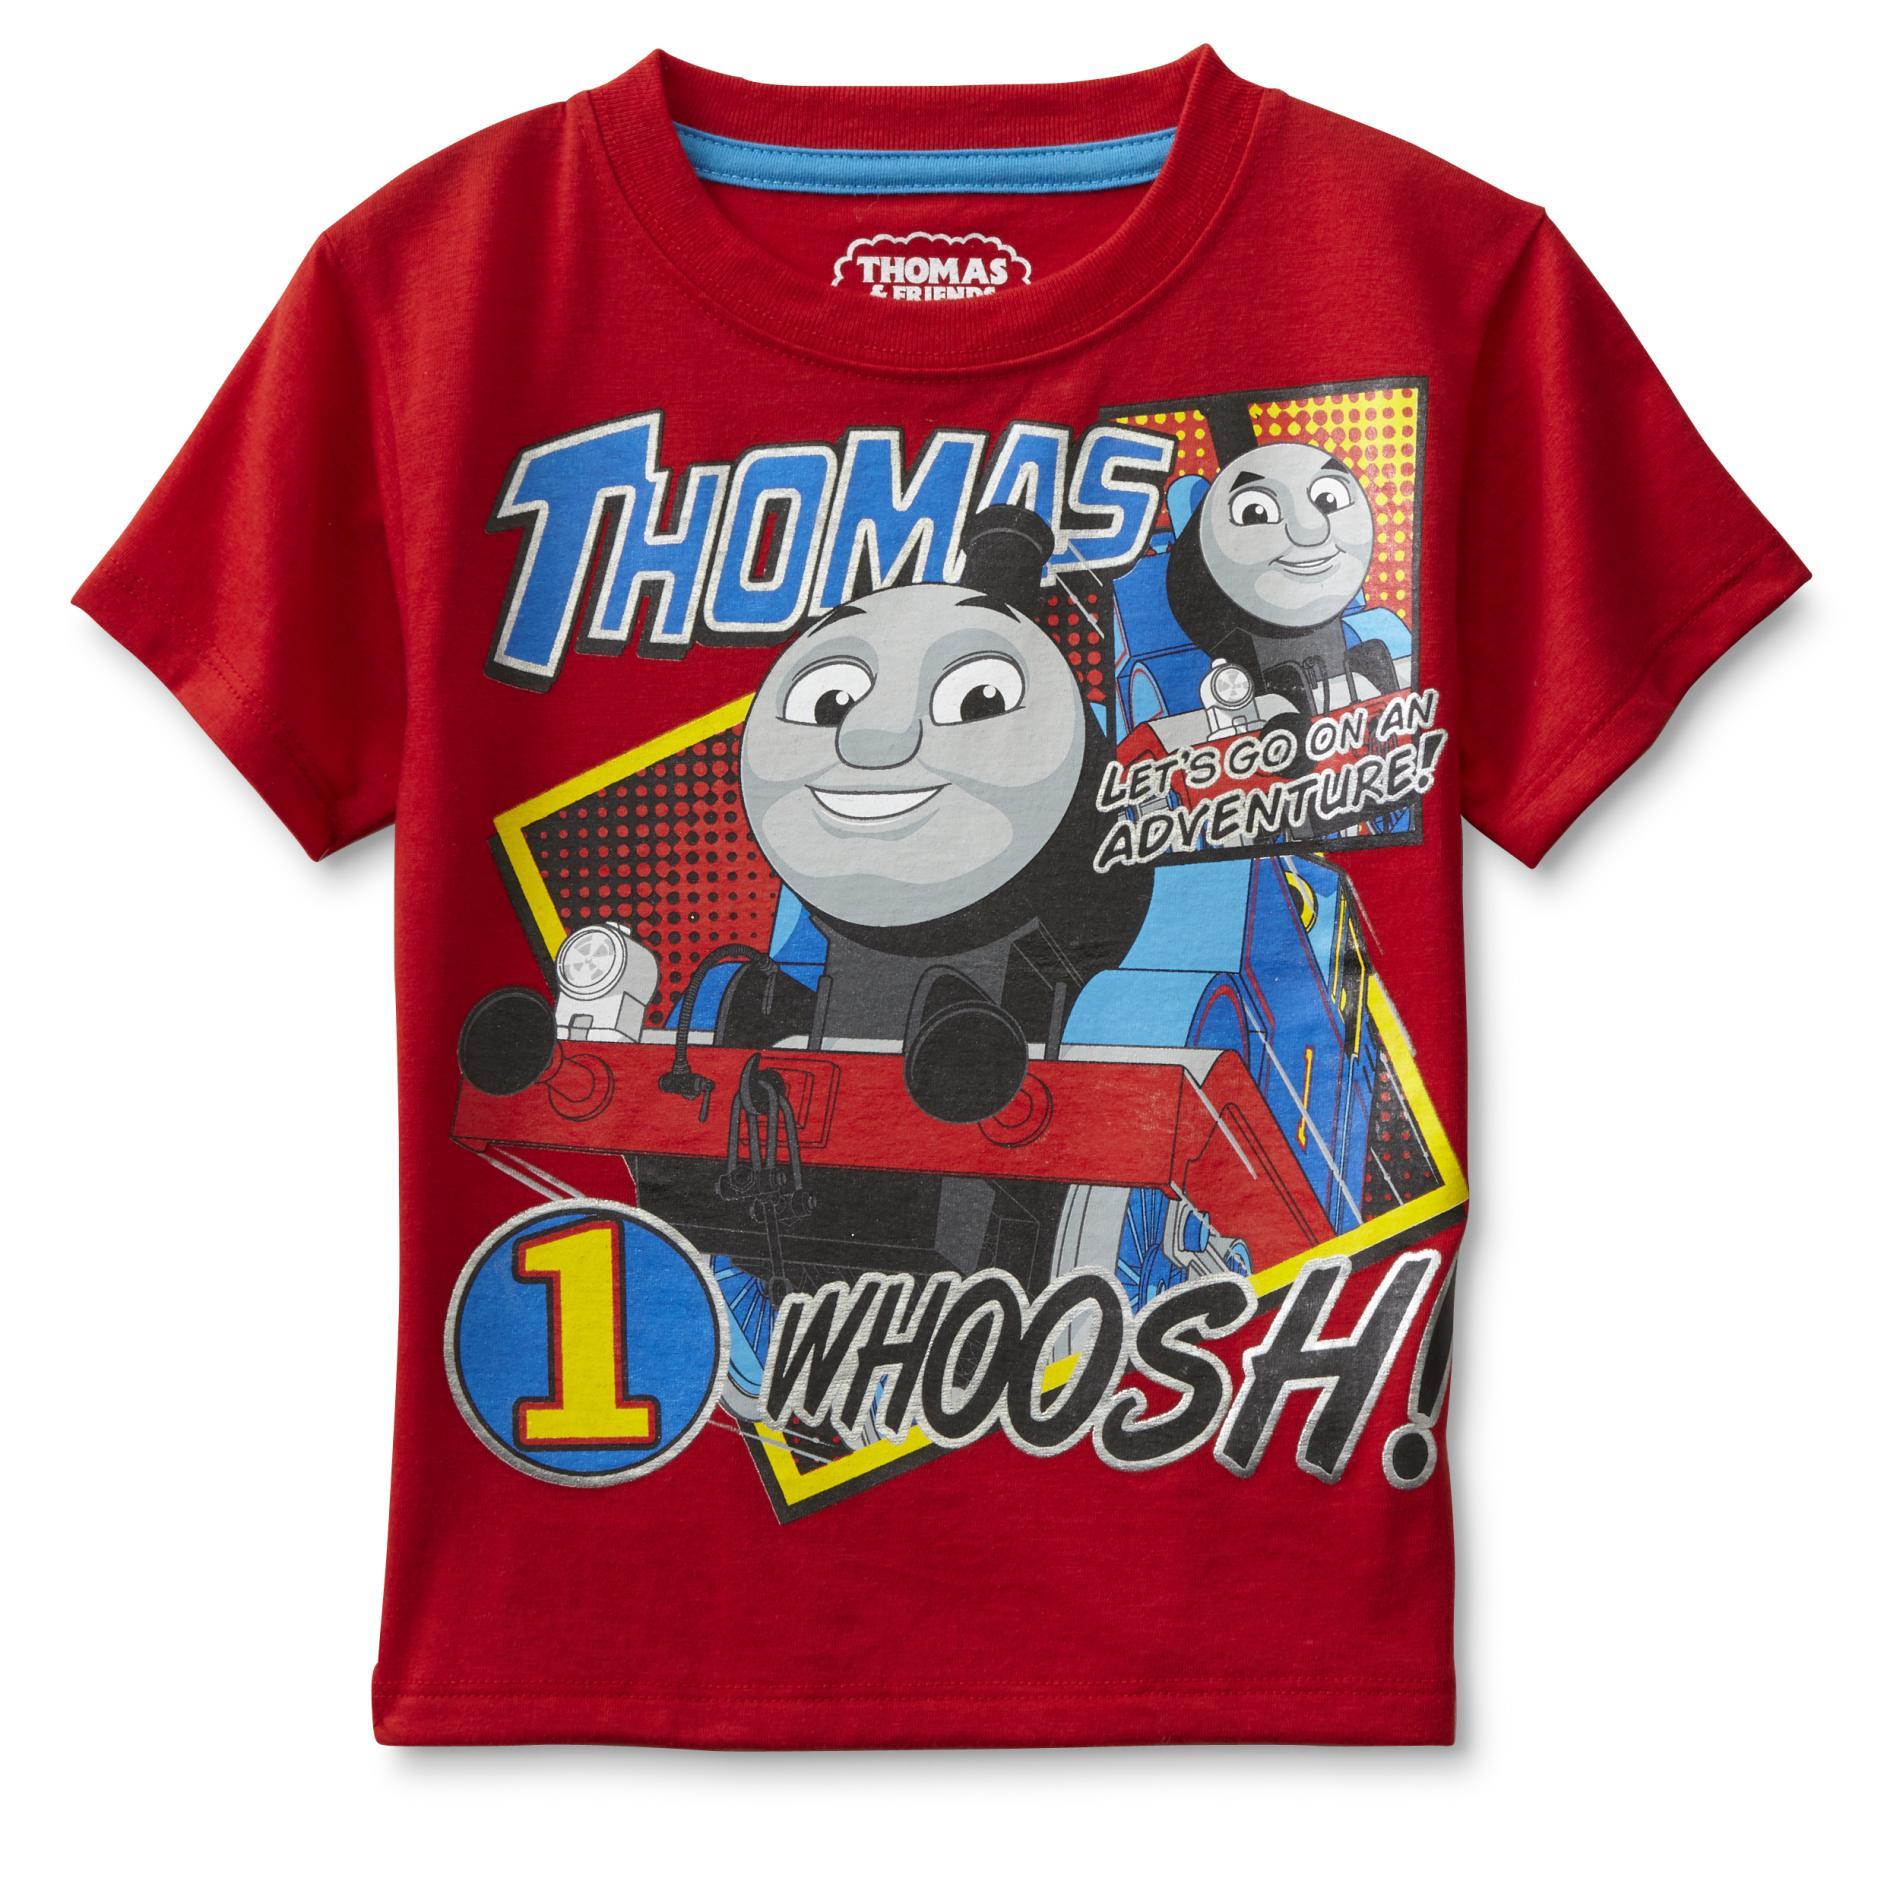 Thomas & Friends Toddler Boy's T-Shirt